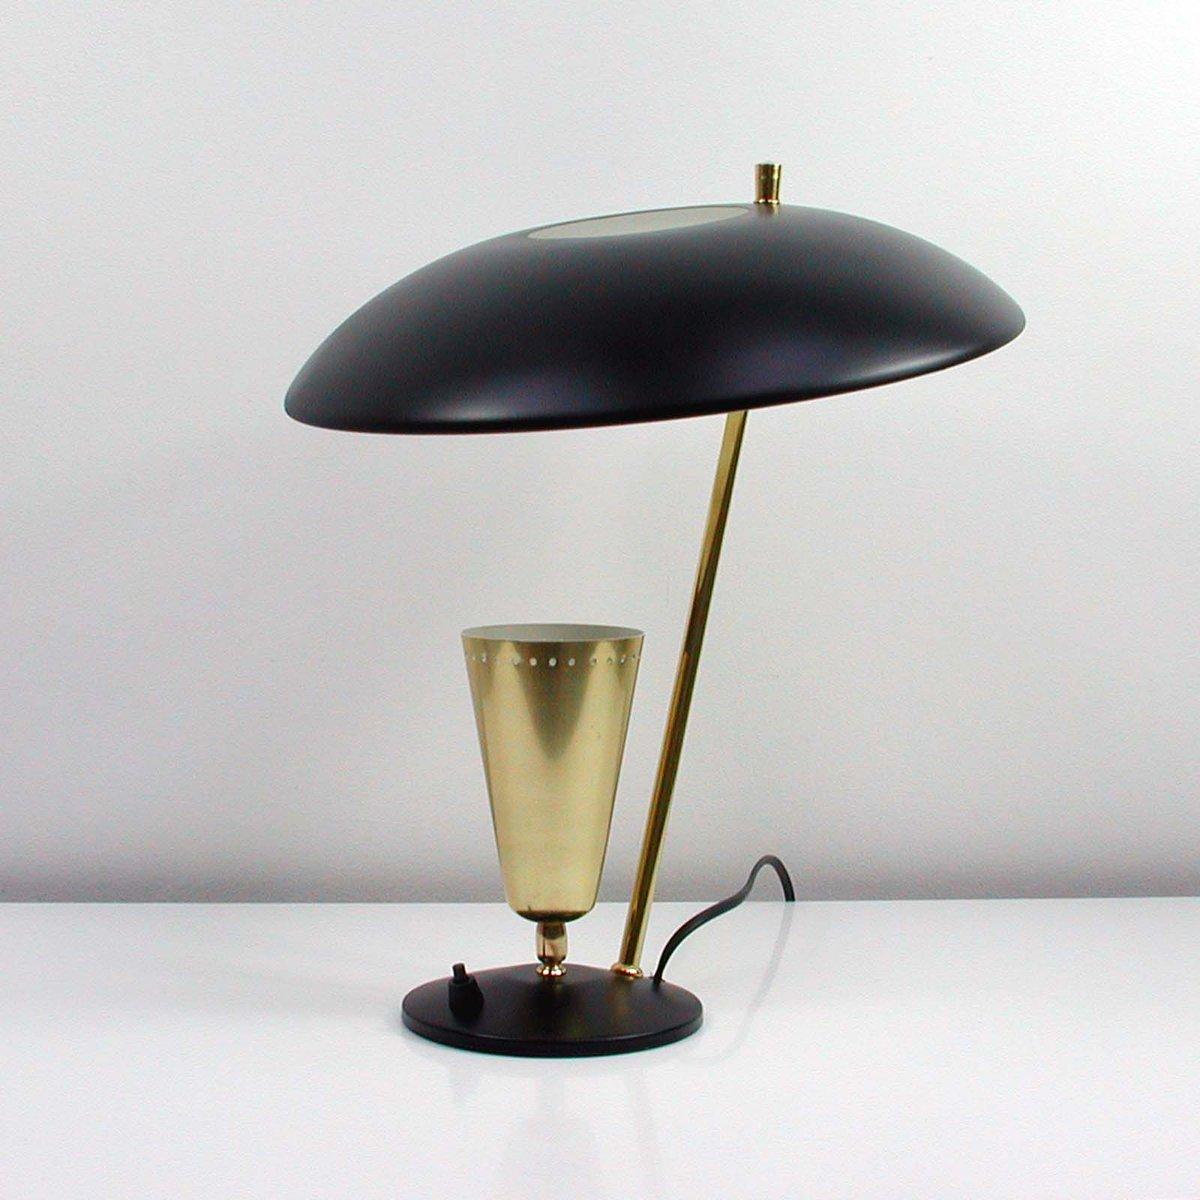 Lampada da tavolo riflessa vintage di aluminor francia - Lampada da tavolo vintage ...